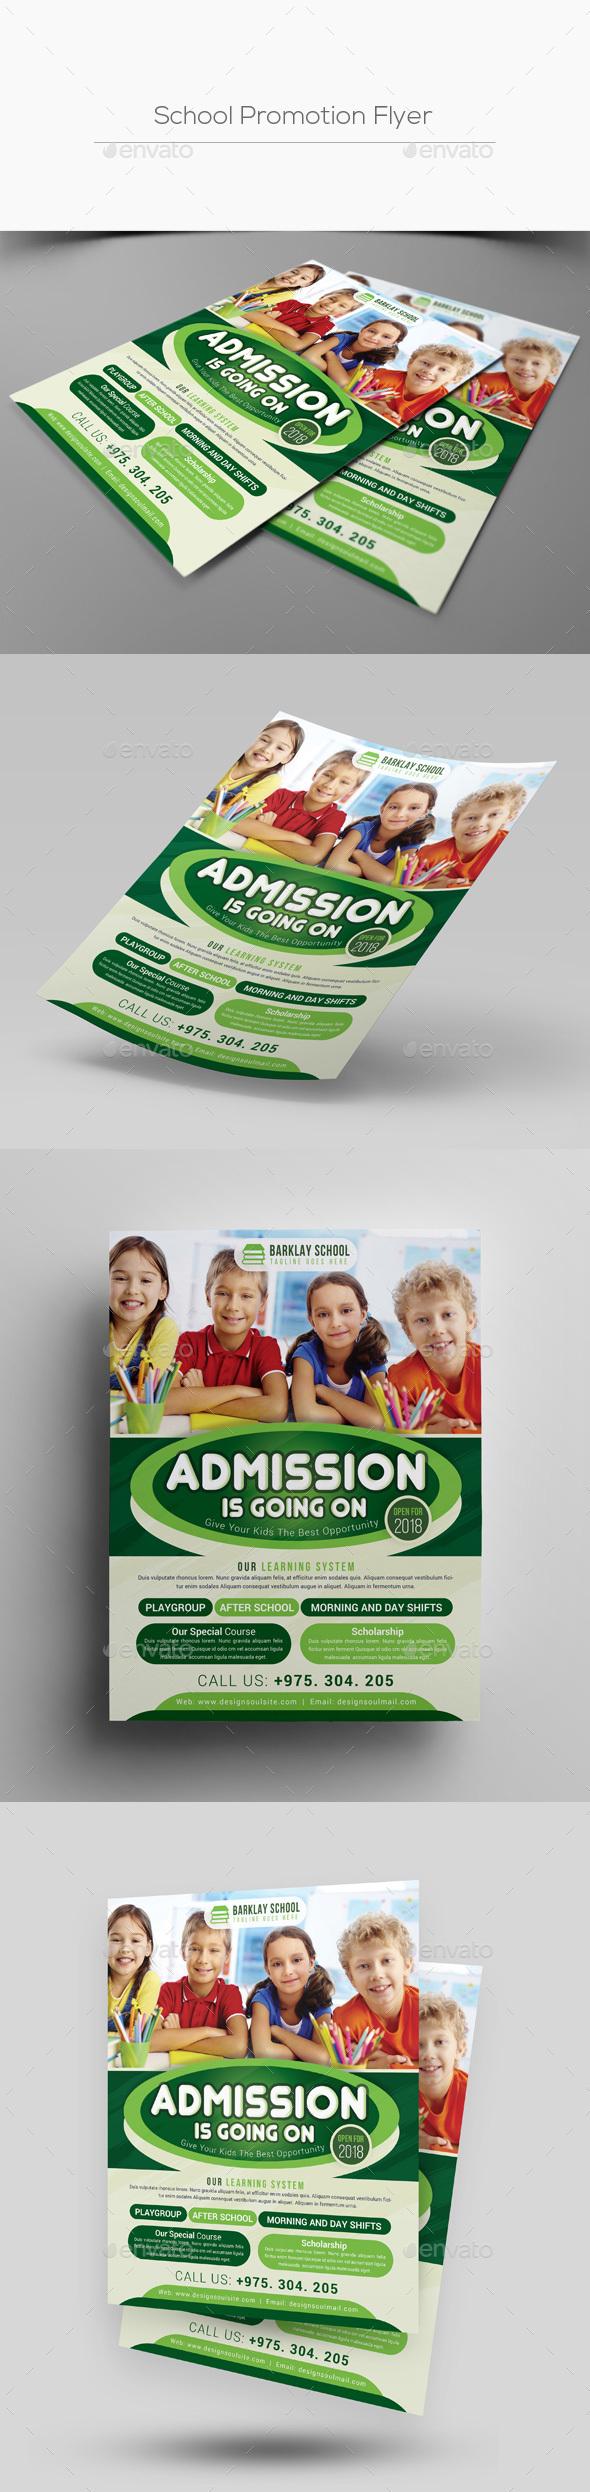 School Promotion Flyer - Corporate Flyers